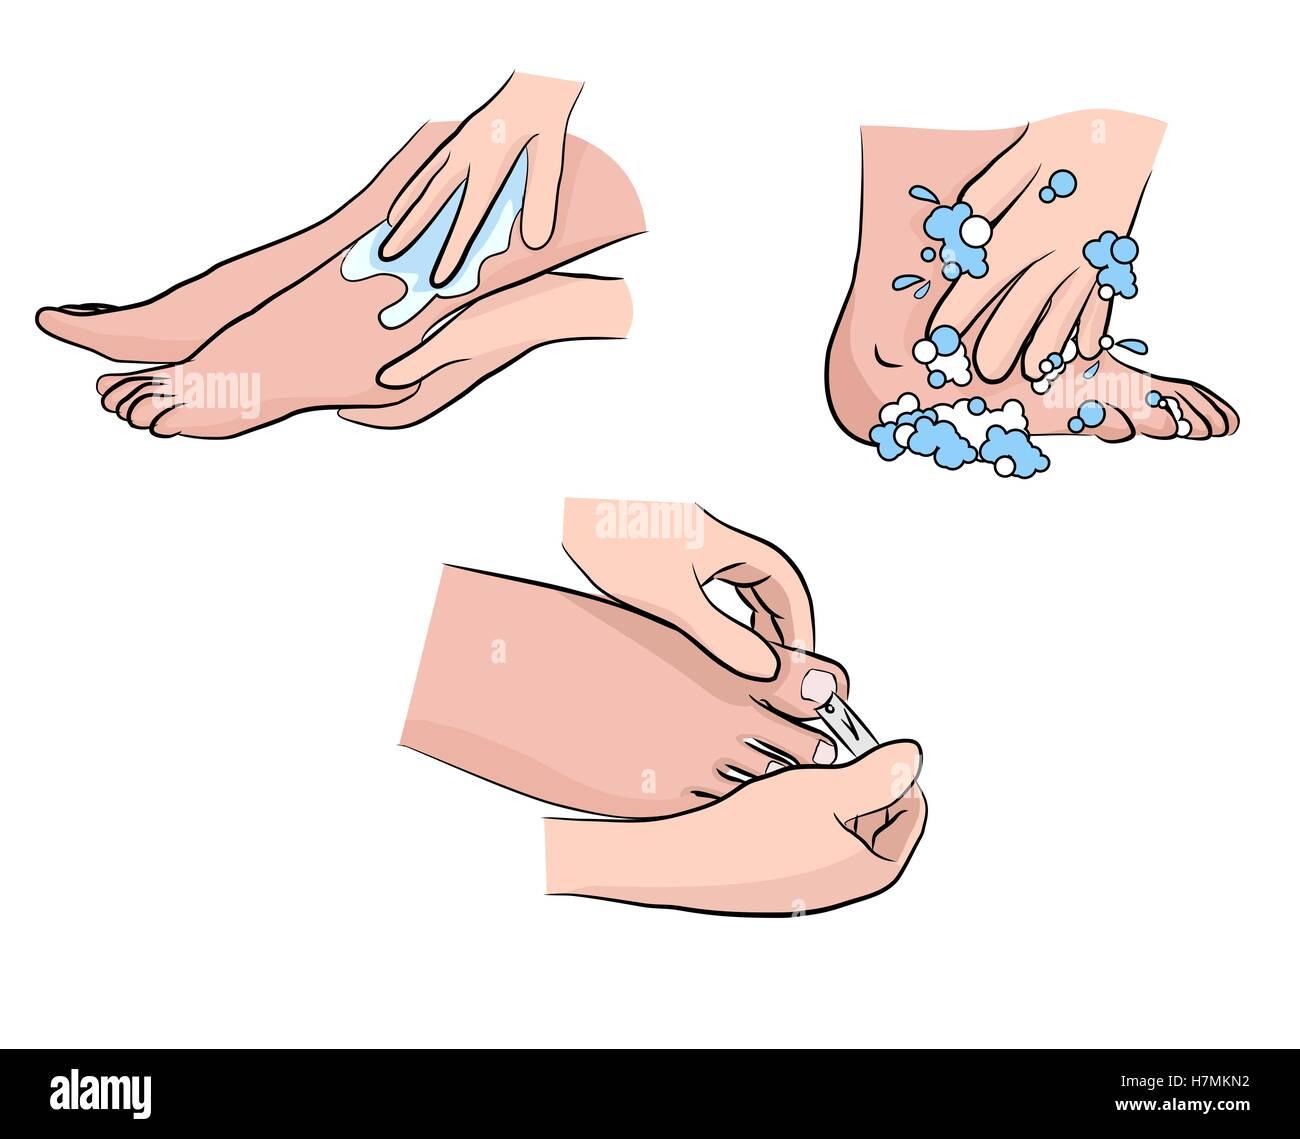 Diabetic Foot Care Stock Photo Alamy